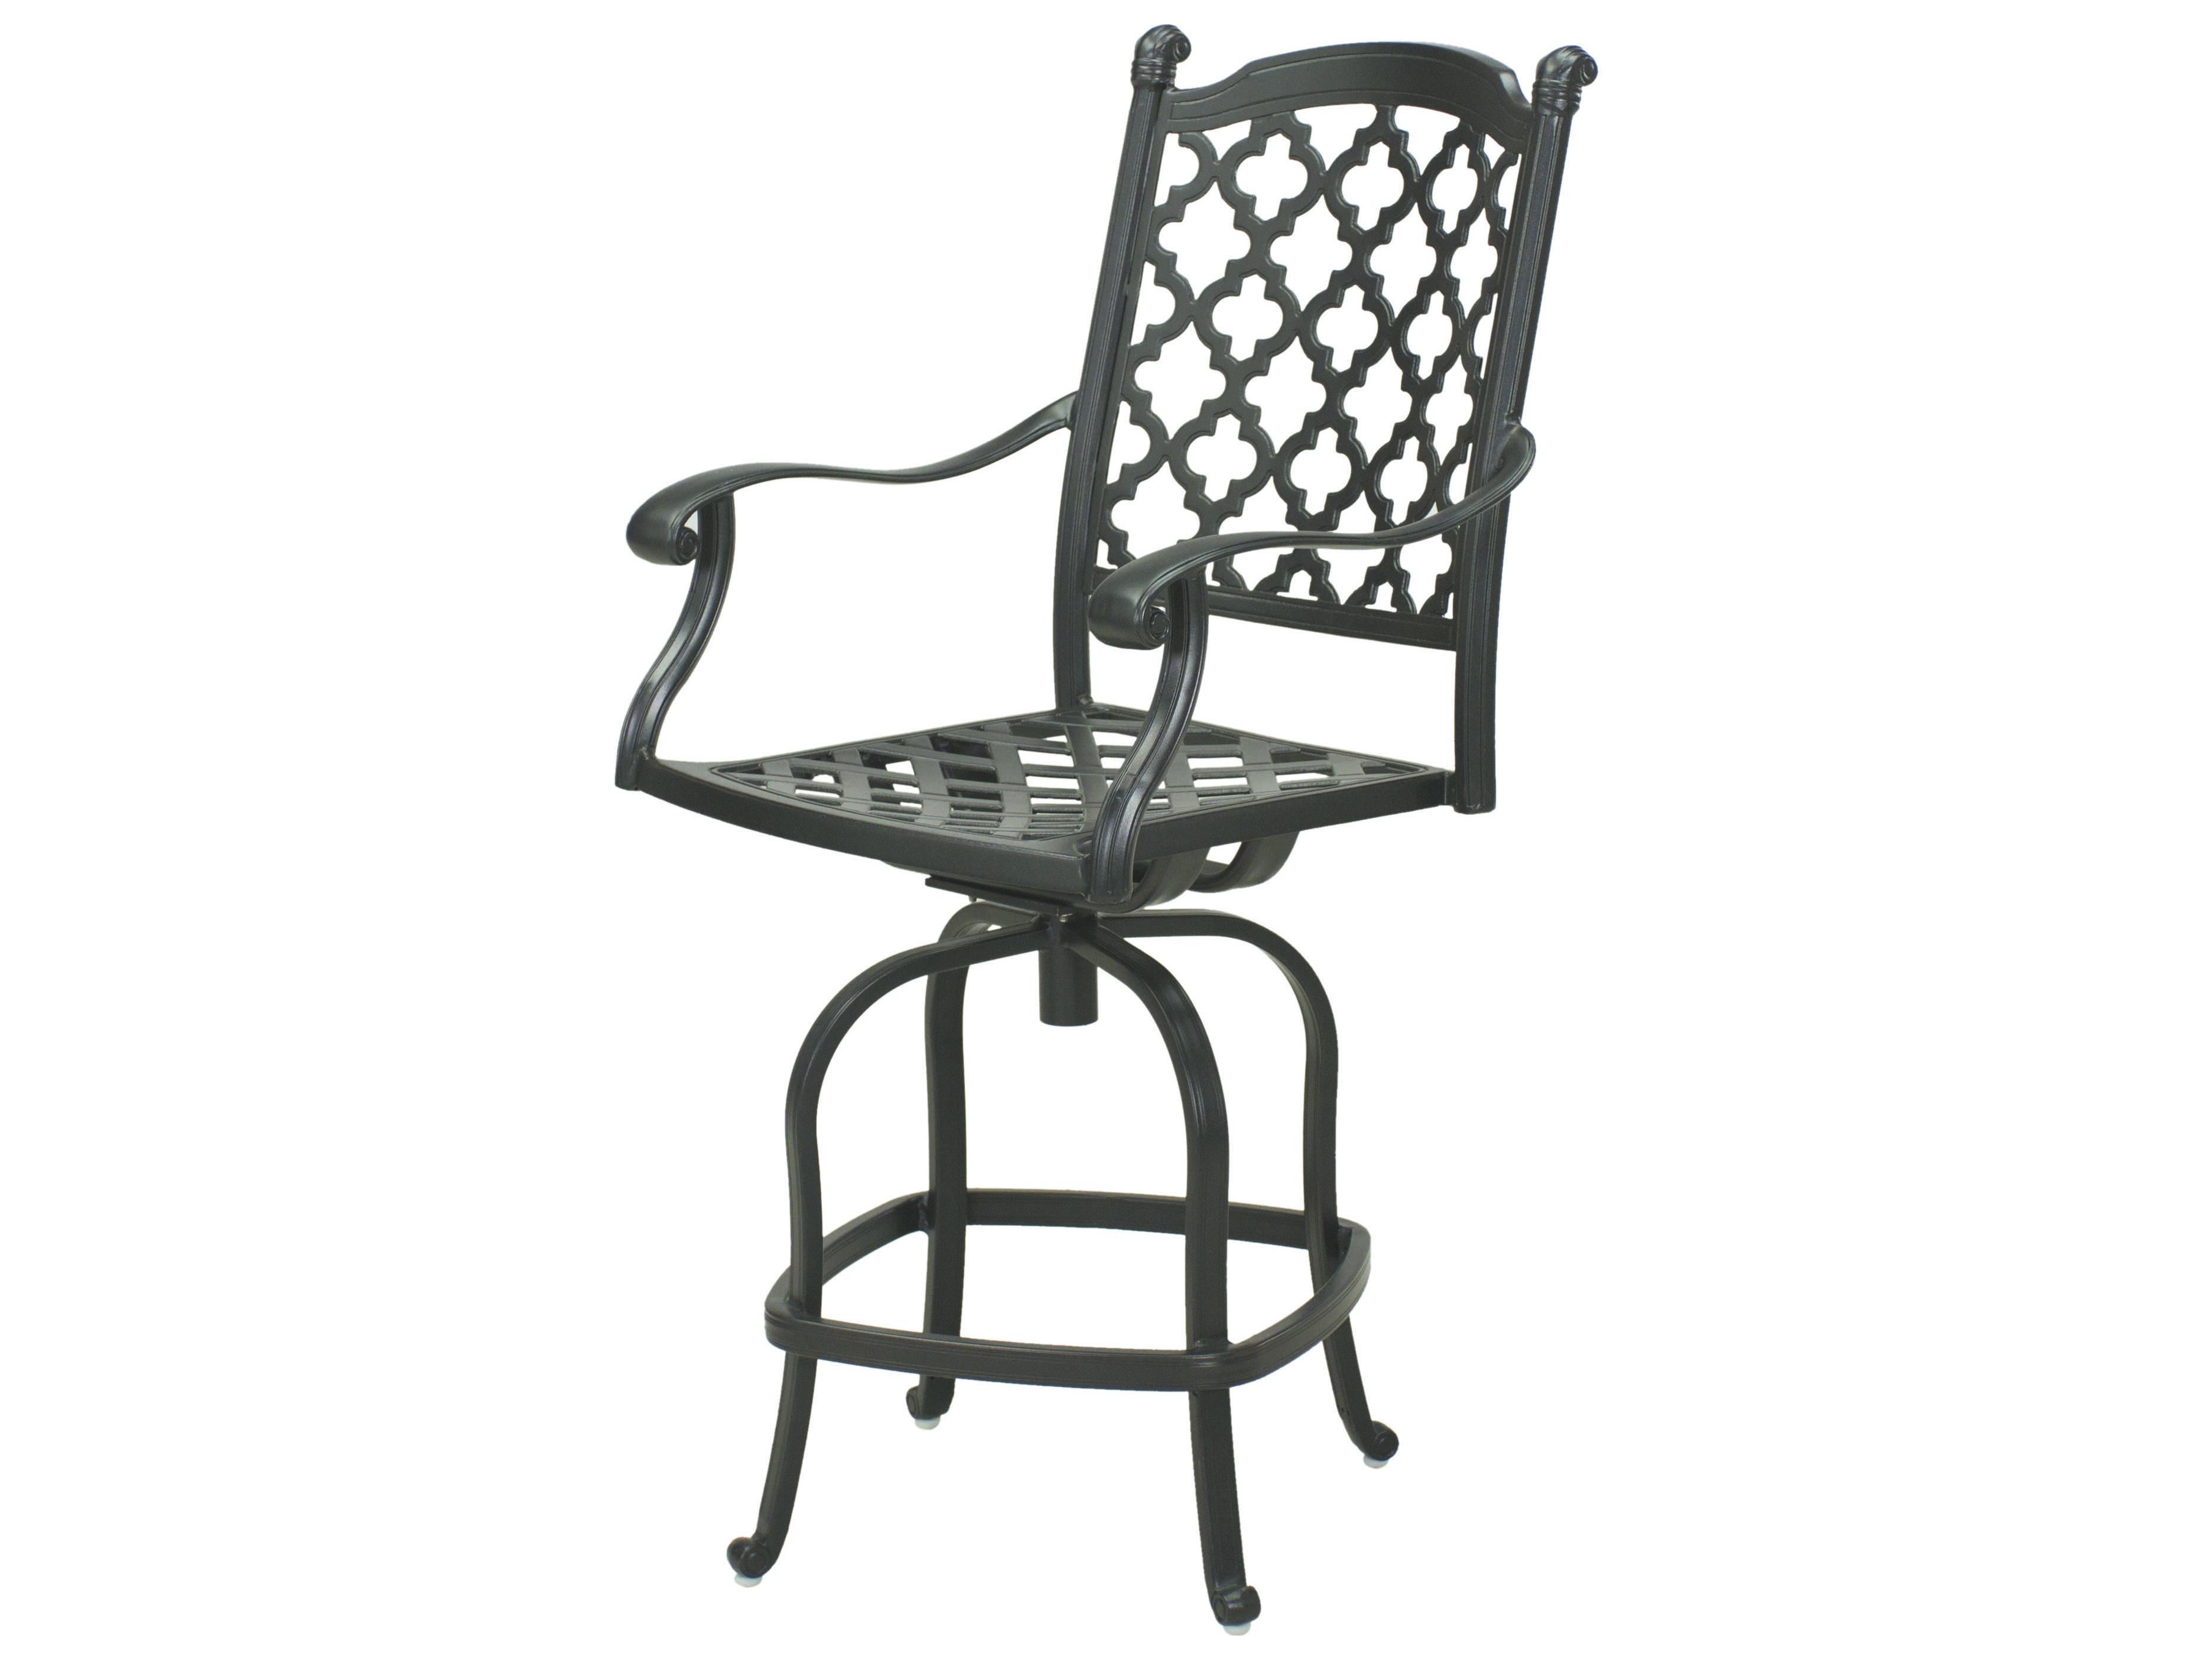 darlee outdoor living standard madison cast aluminum counter height swivel bar stool in antique. Black Bedroom Furniture Sets. Home Design Ideas